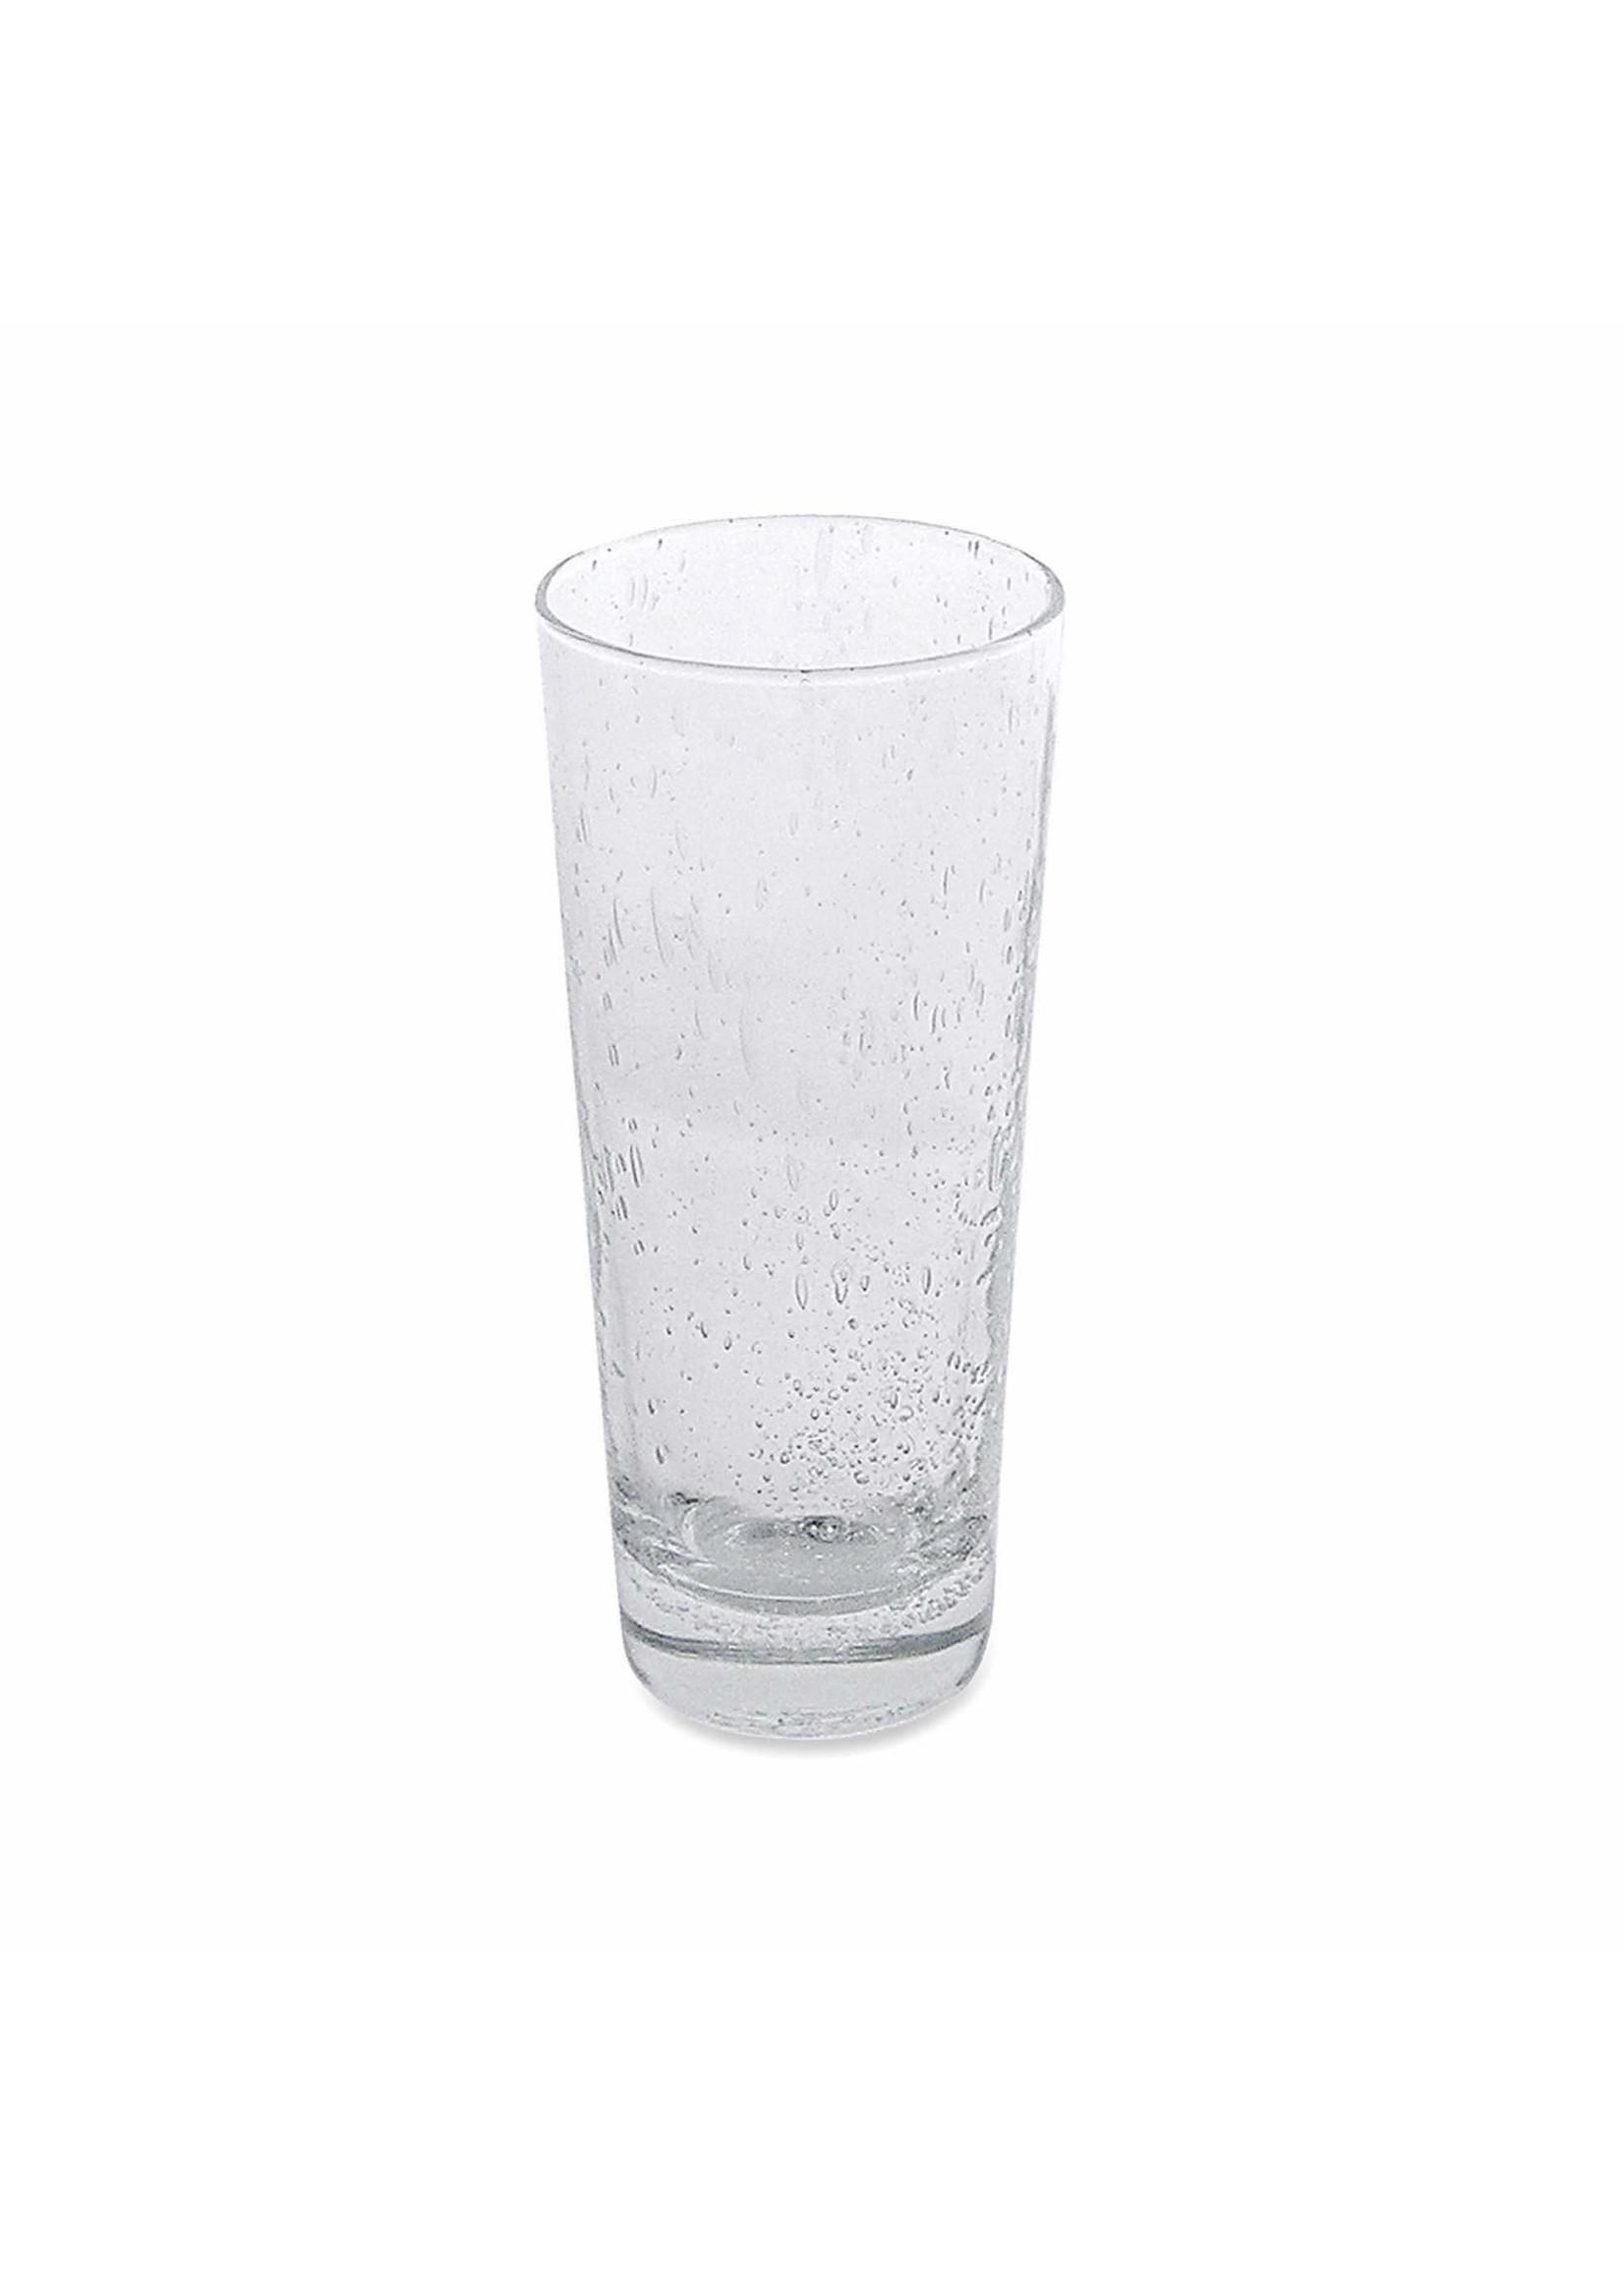 Bellini Iced Tea Glass